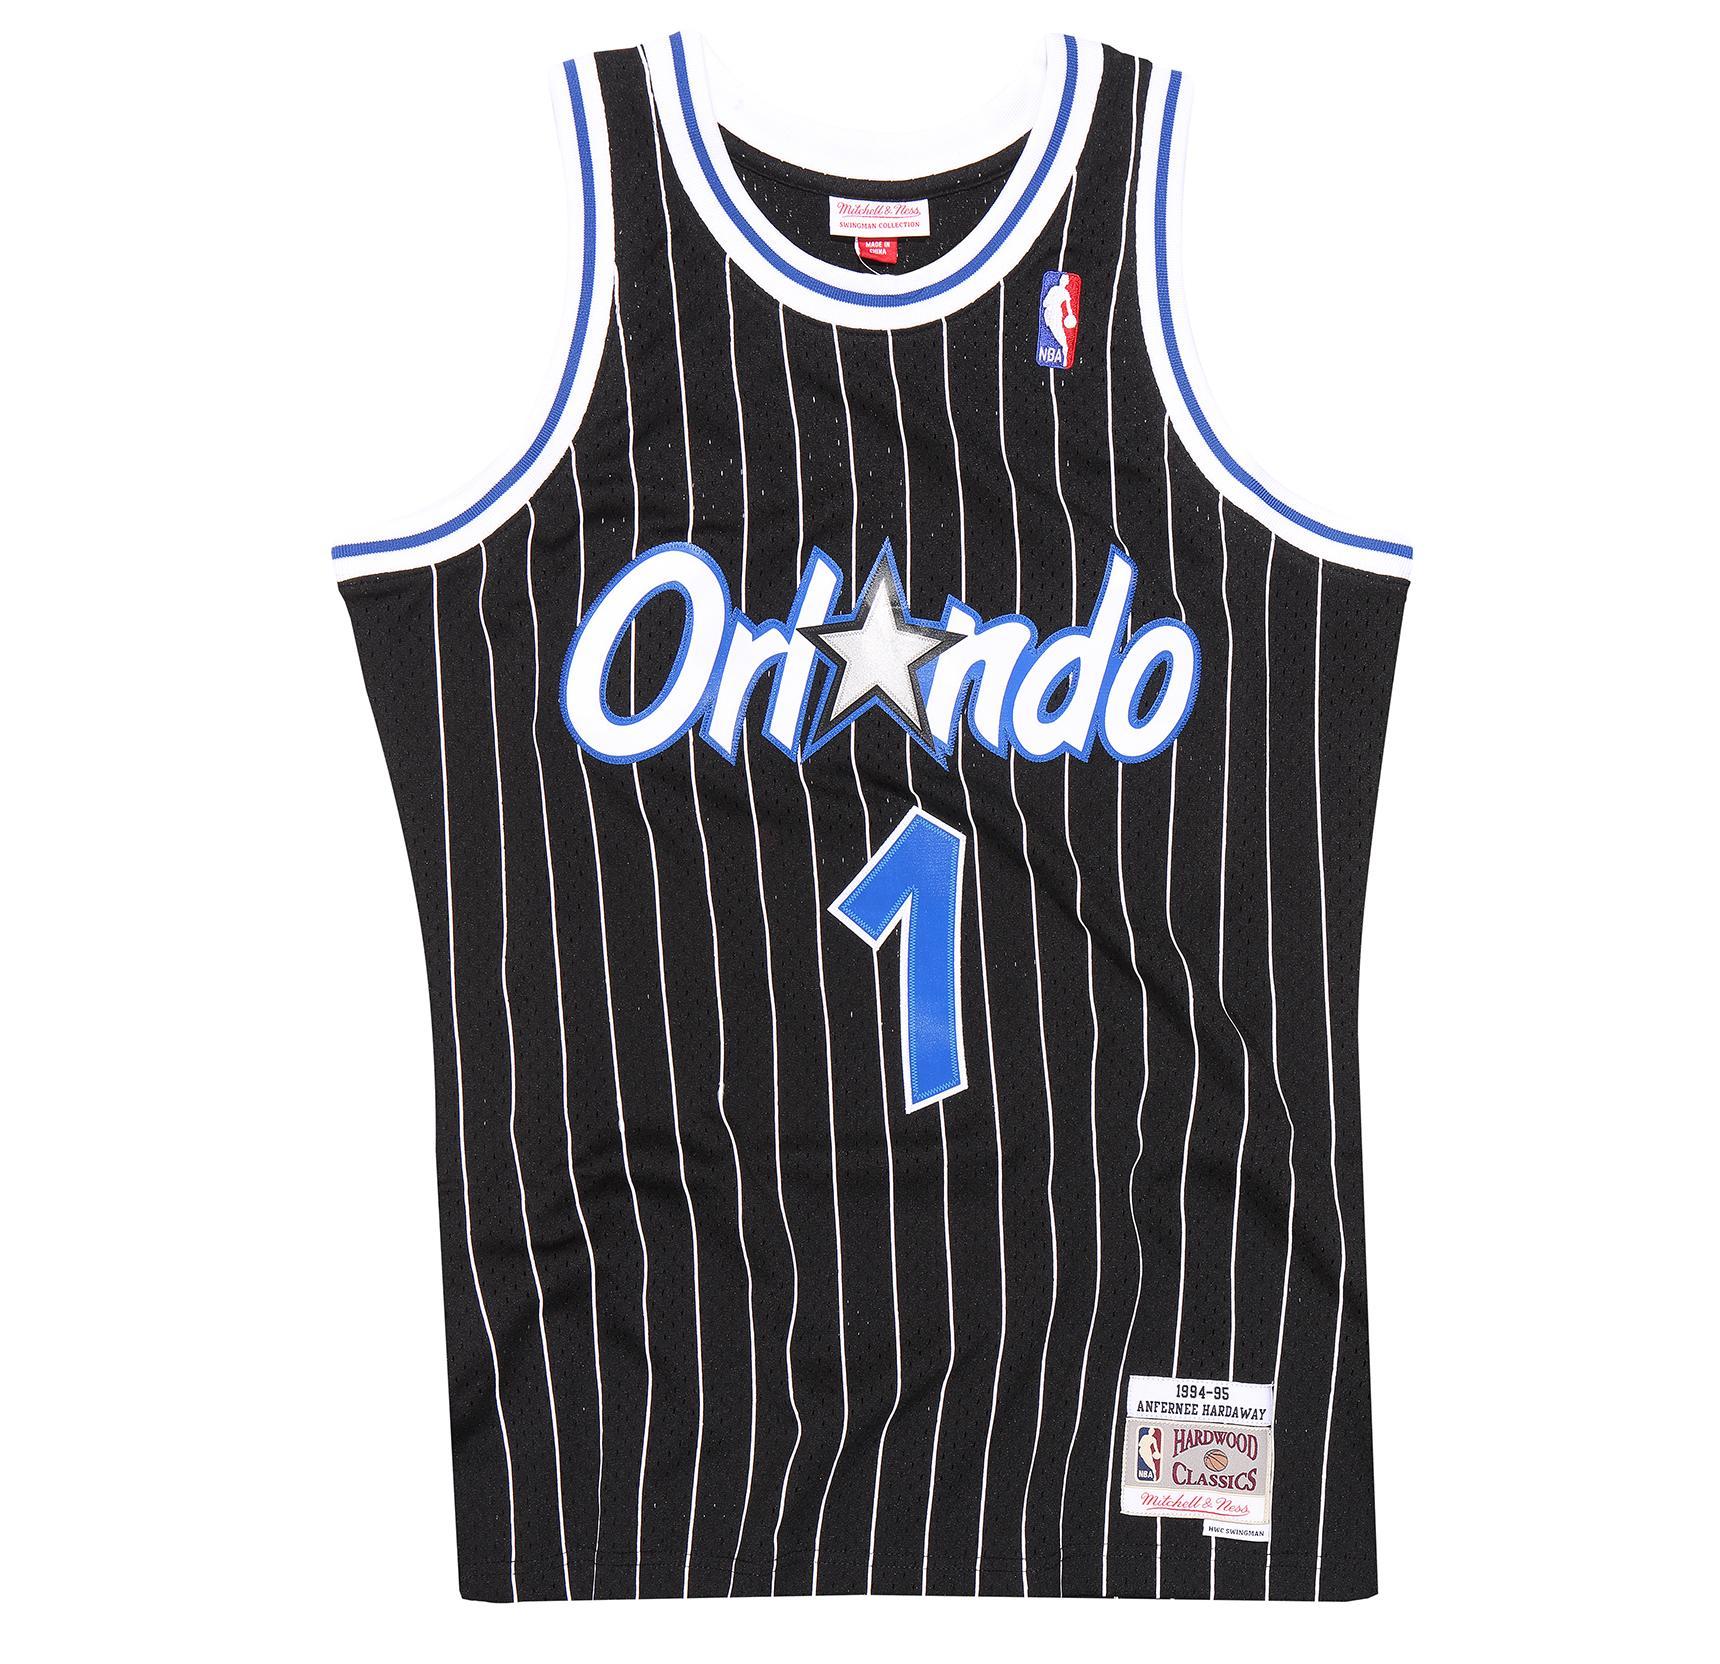 fe190696 Mitchell & Ness | Orlando Magic Black Anfernee Hardaway 1994-95 Swingman  Jersey